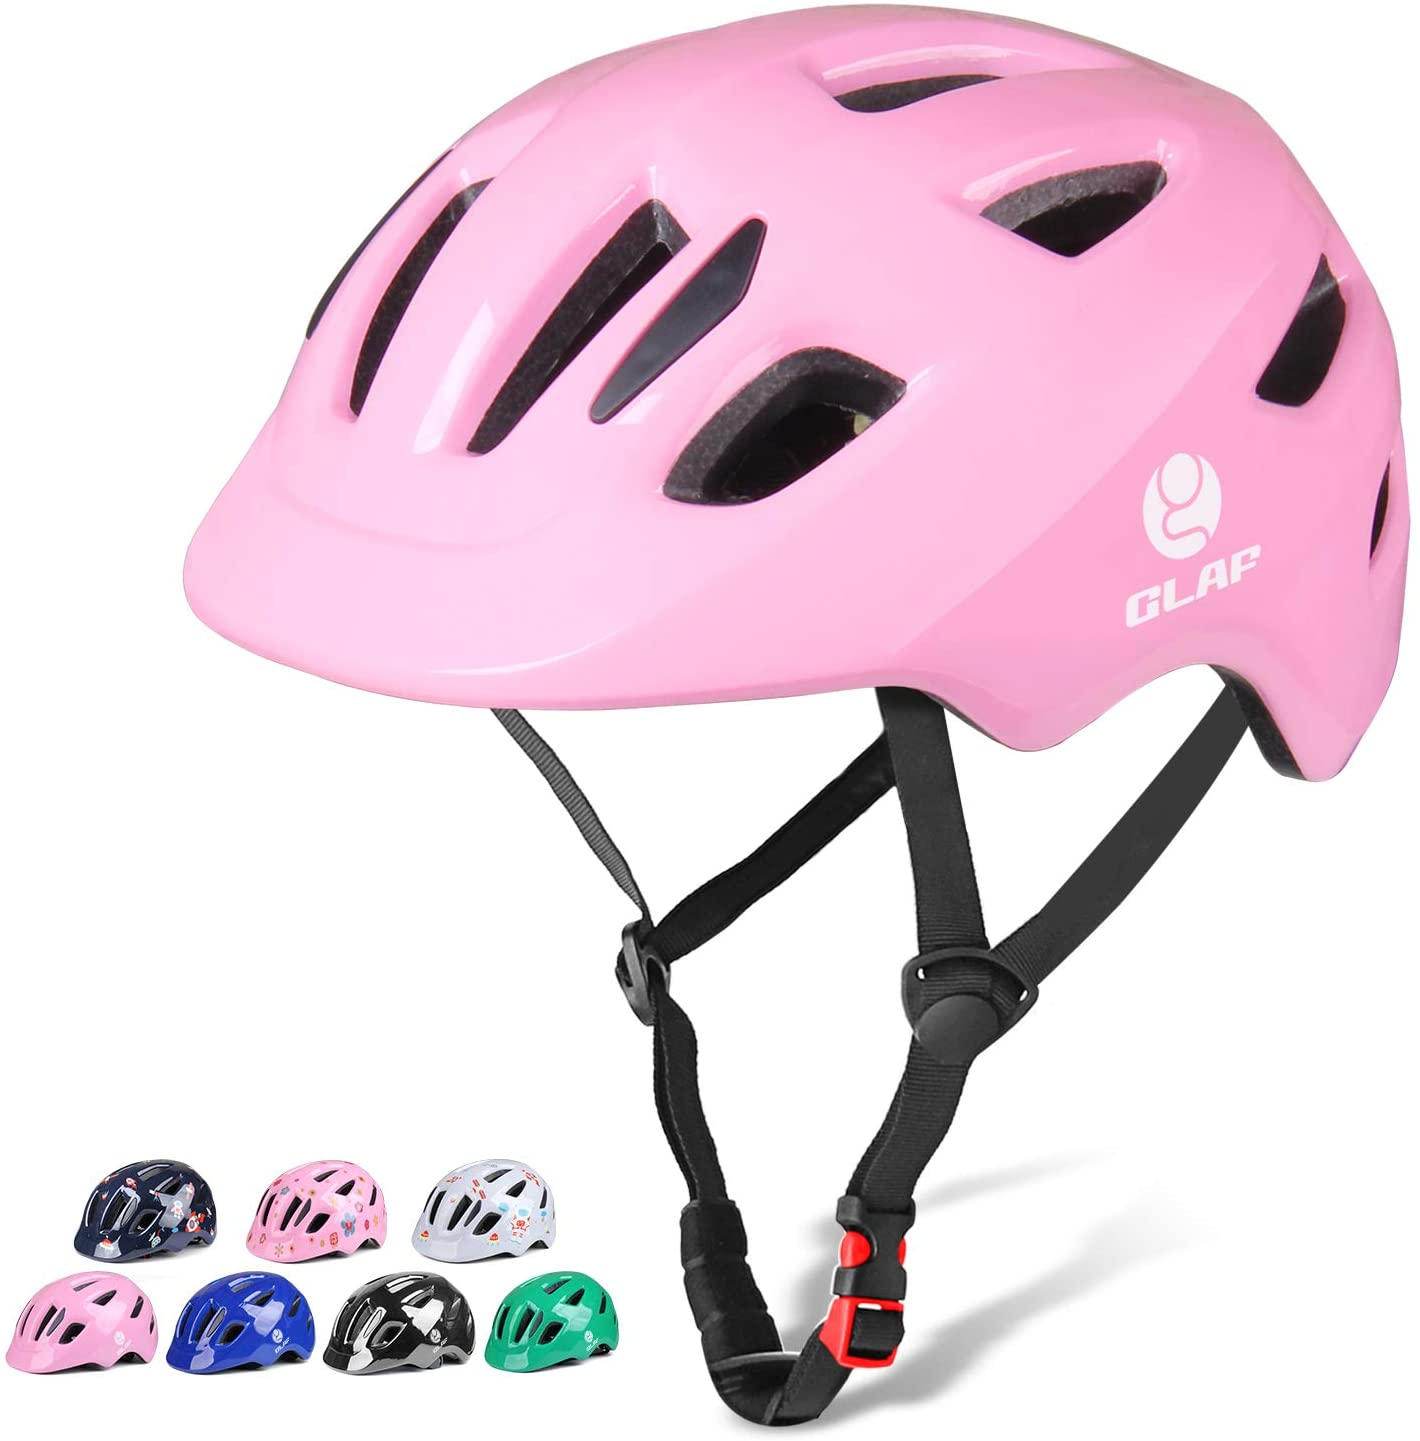 Glaf Toddler Bike Helmet Toddler Helmet Children Multi-Sport Helmet CPSC Certified Impact Resistance Ventilation Adjustable Helmet